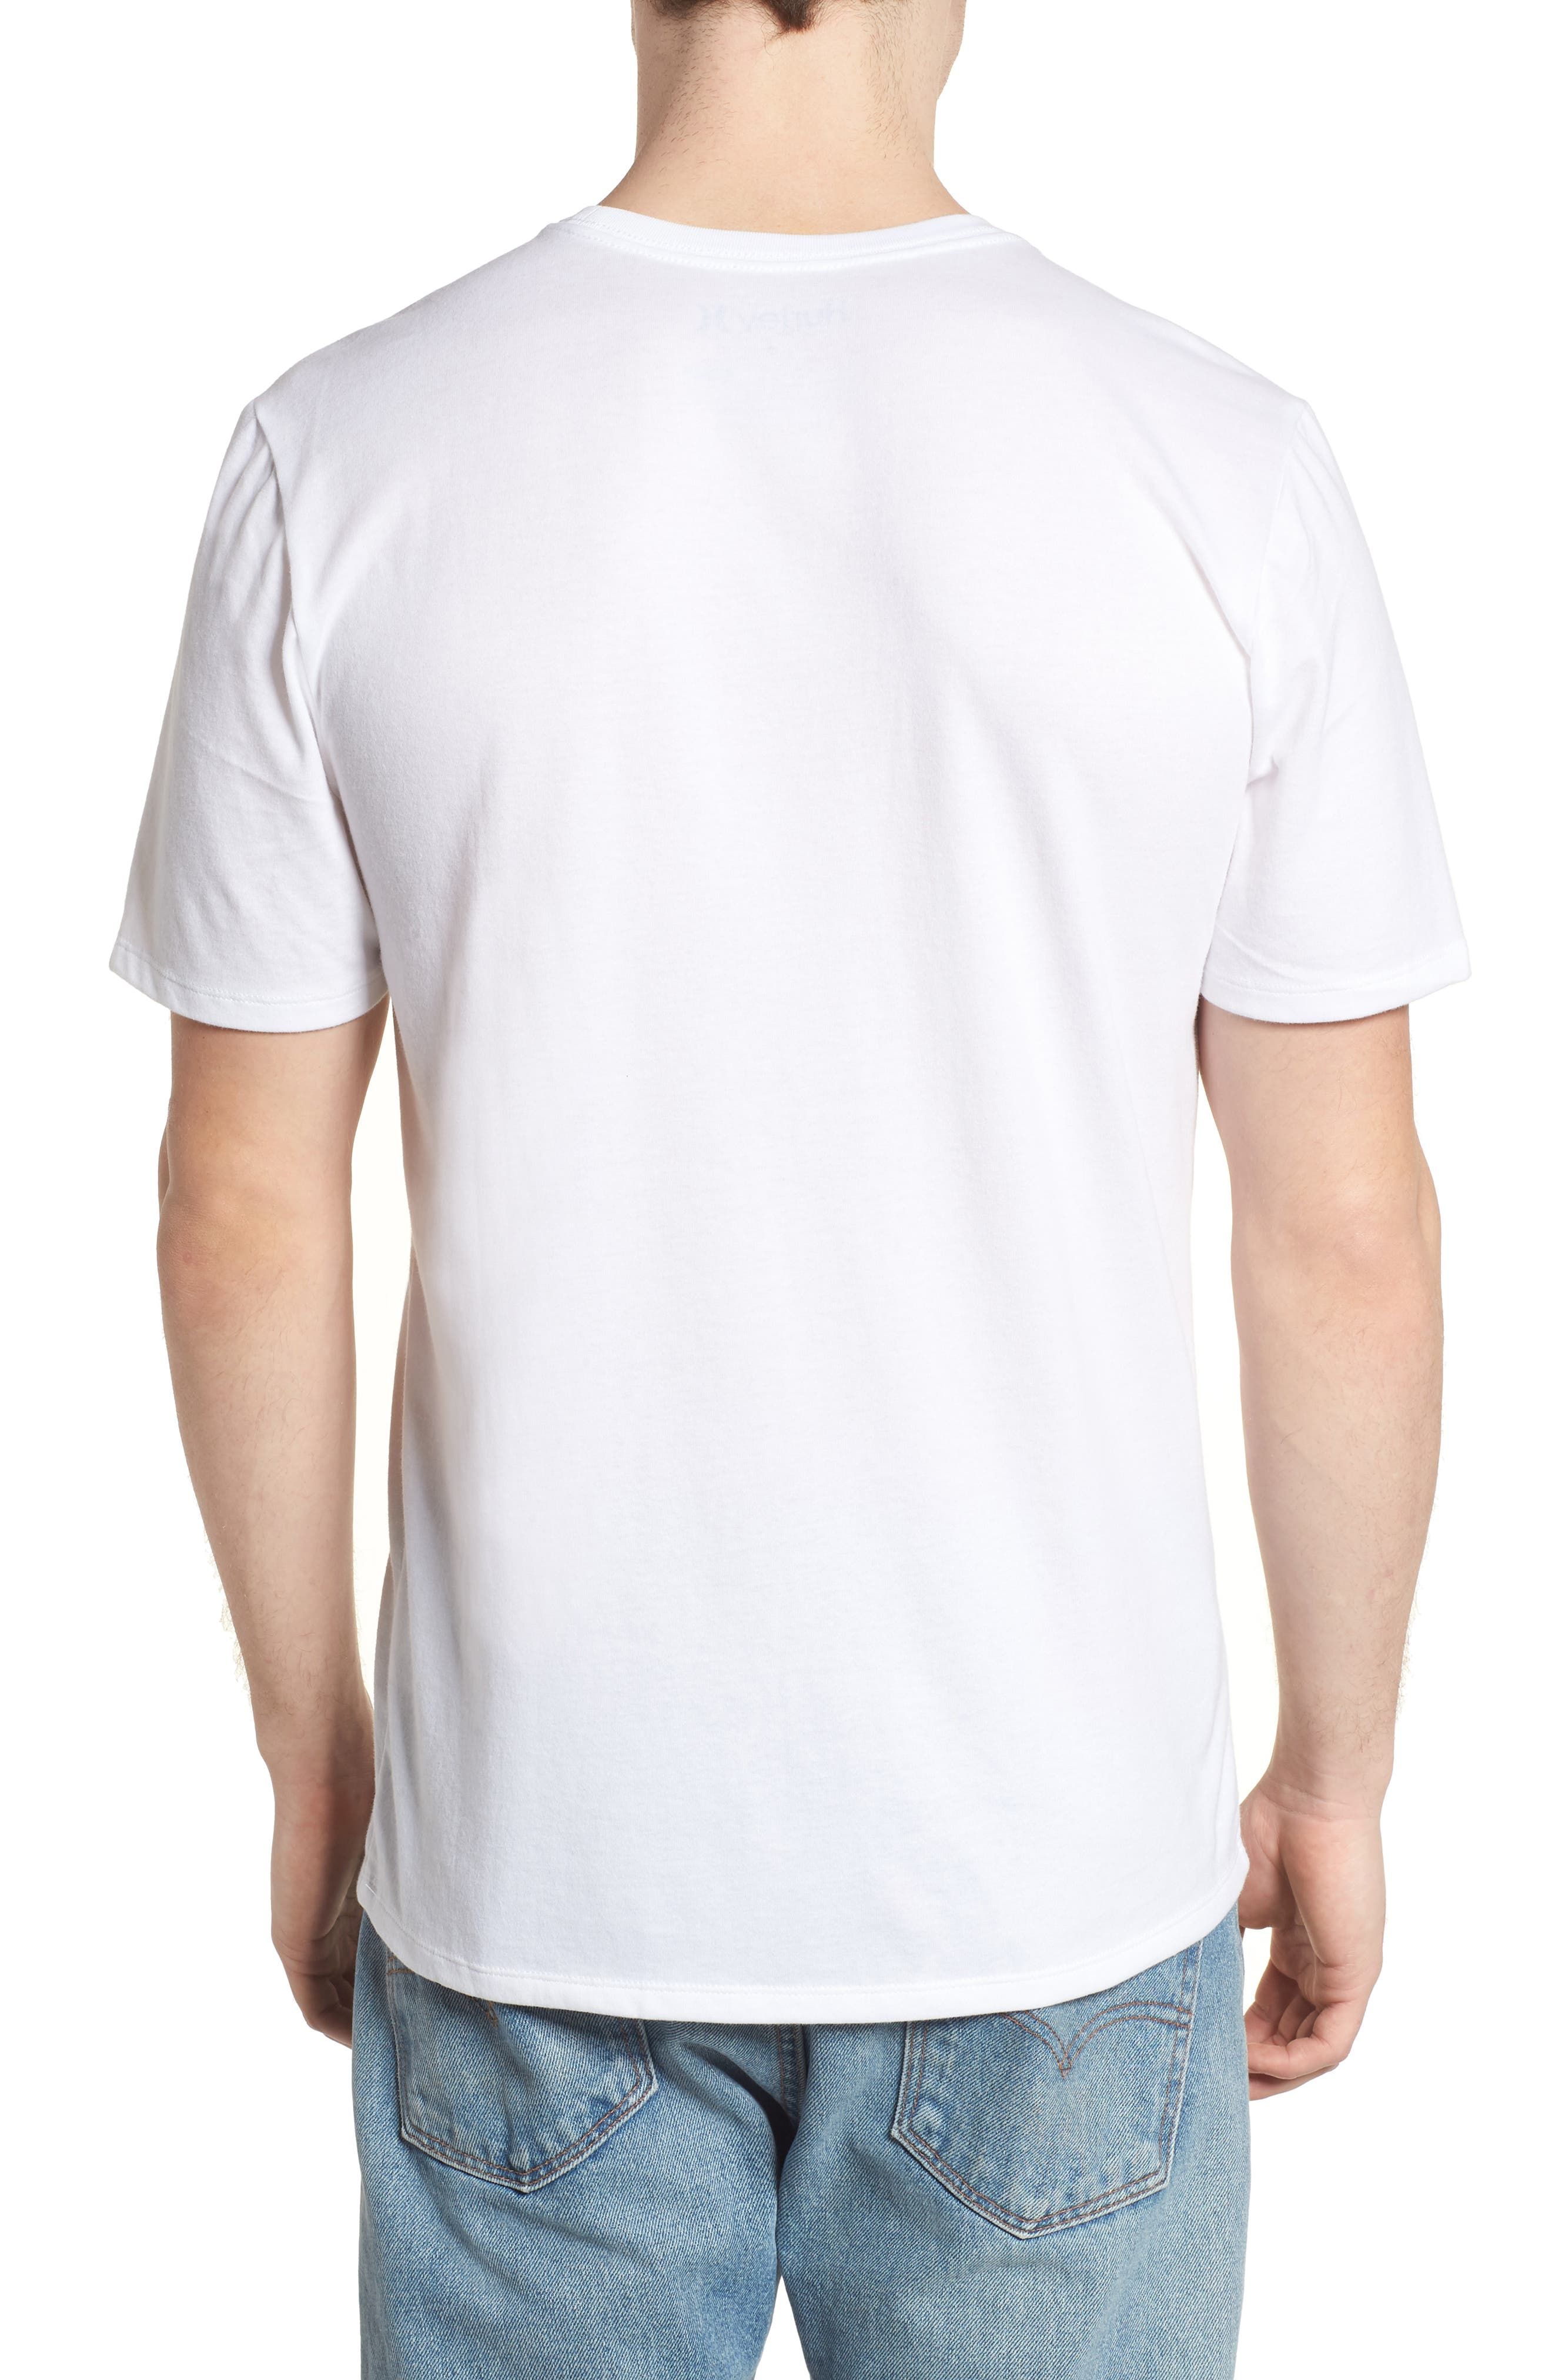 Cause & Effect Dri-FIT T-Shirt,                             Alternate thumbnail 2, color,                             100